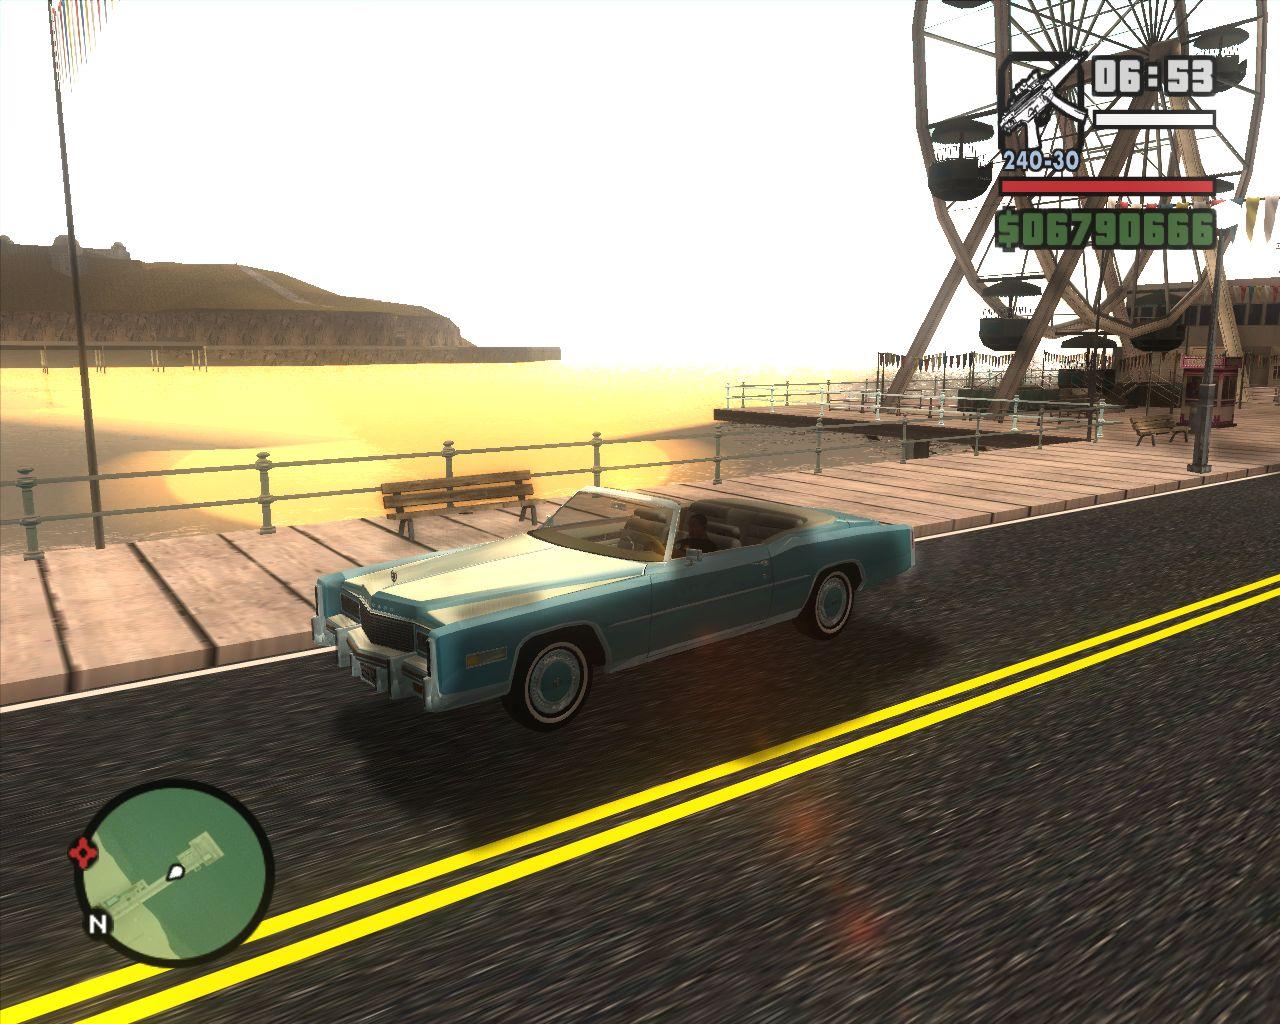 gta_sa 2008-04-07 22-35-44-73.jpg - Grand Theft Auto: San Andreas